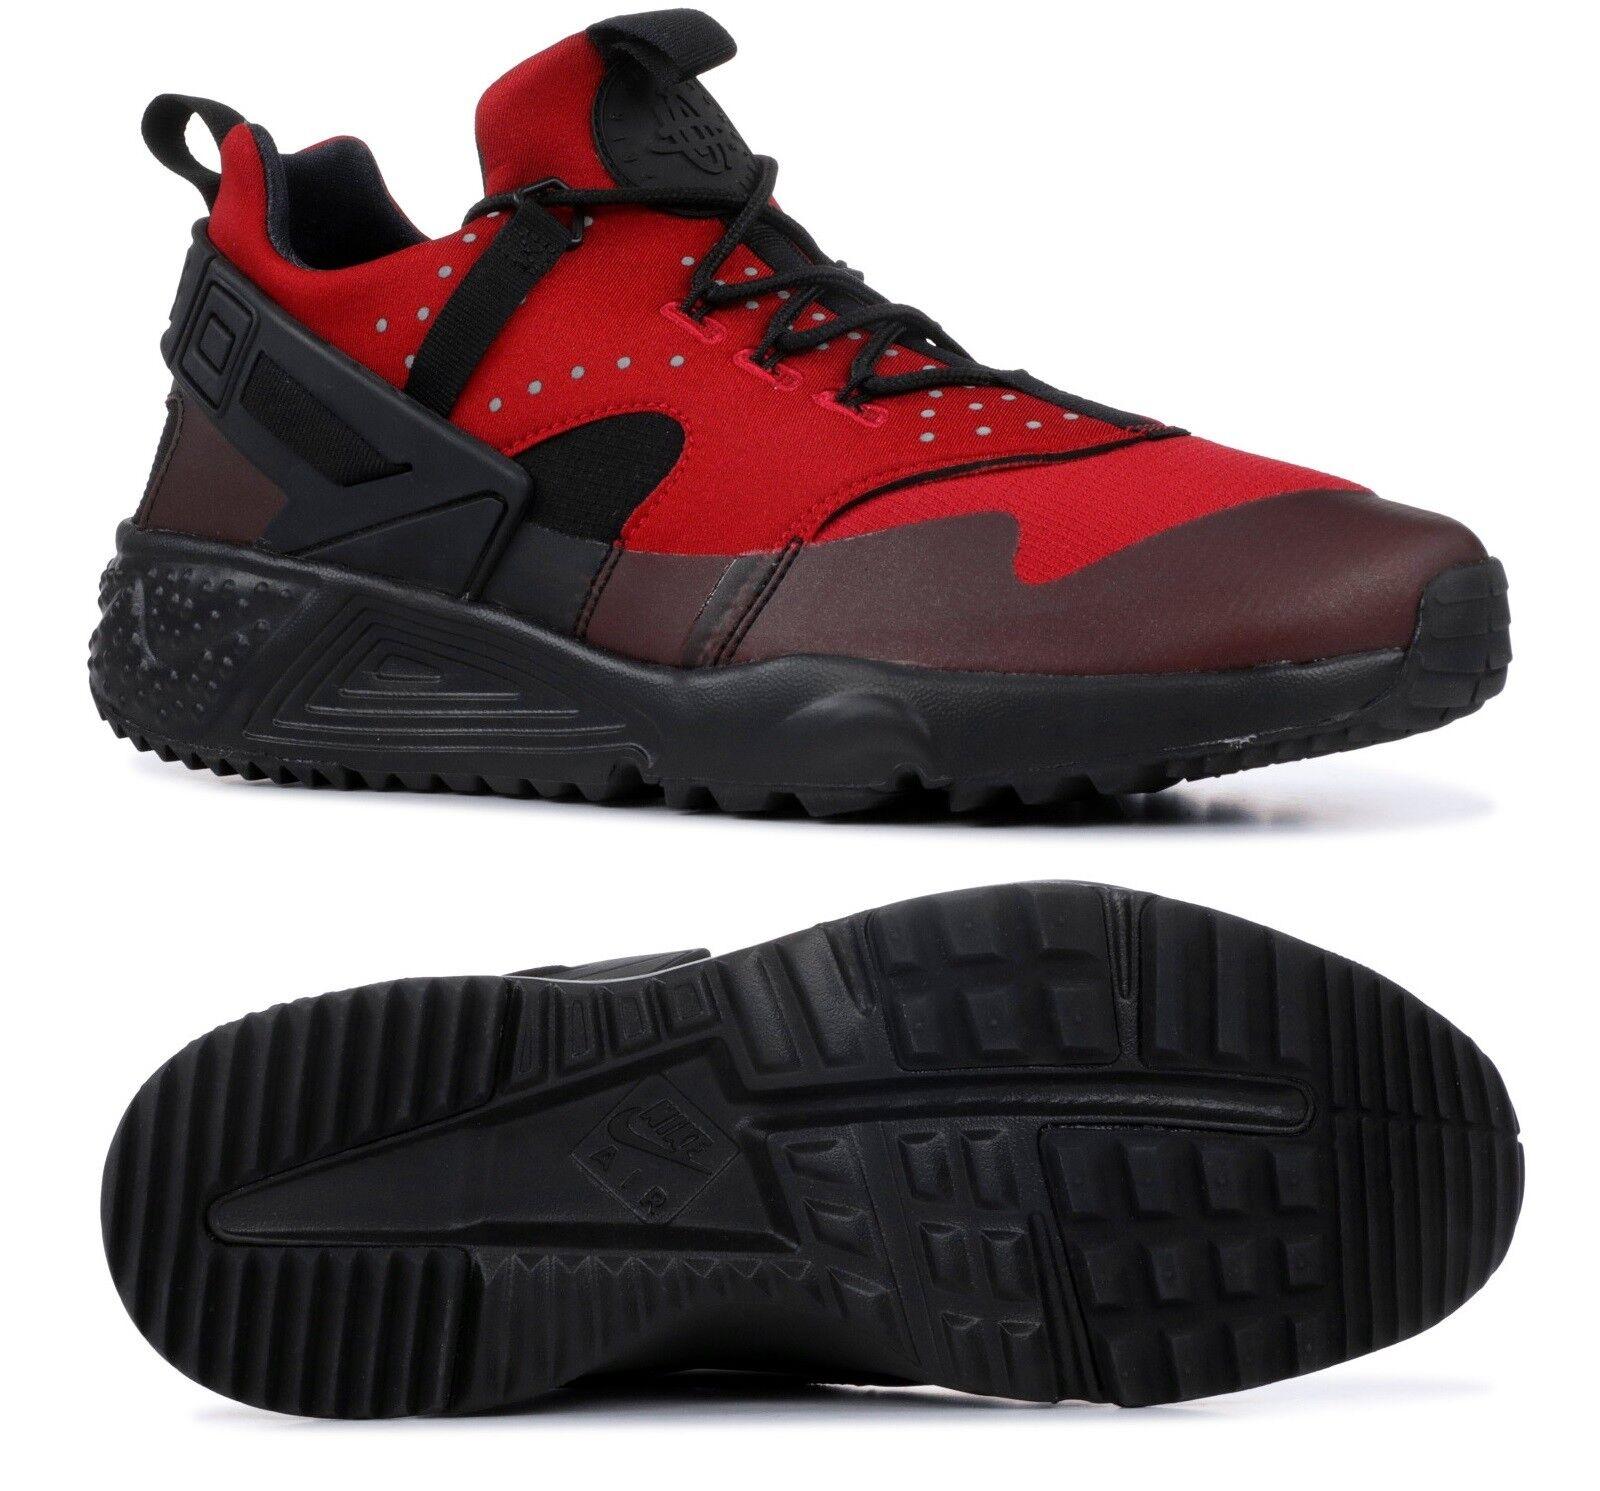 NEW MEN'S NIKE AIR HUARACHE UTILITY 806807-600 GYM RED BLACK SZ 12